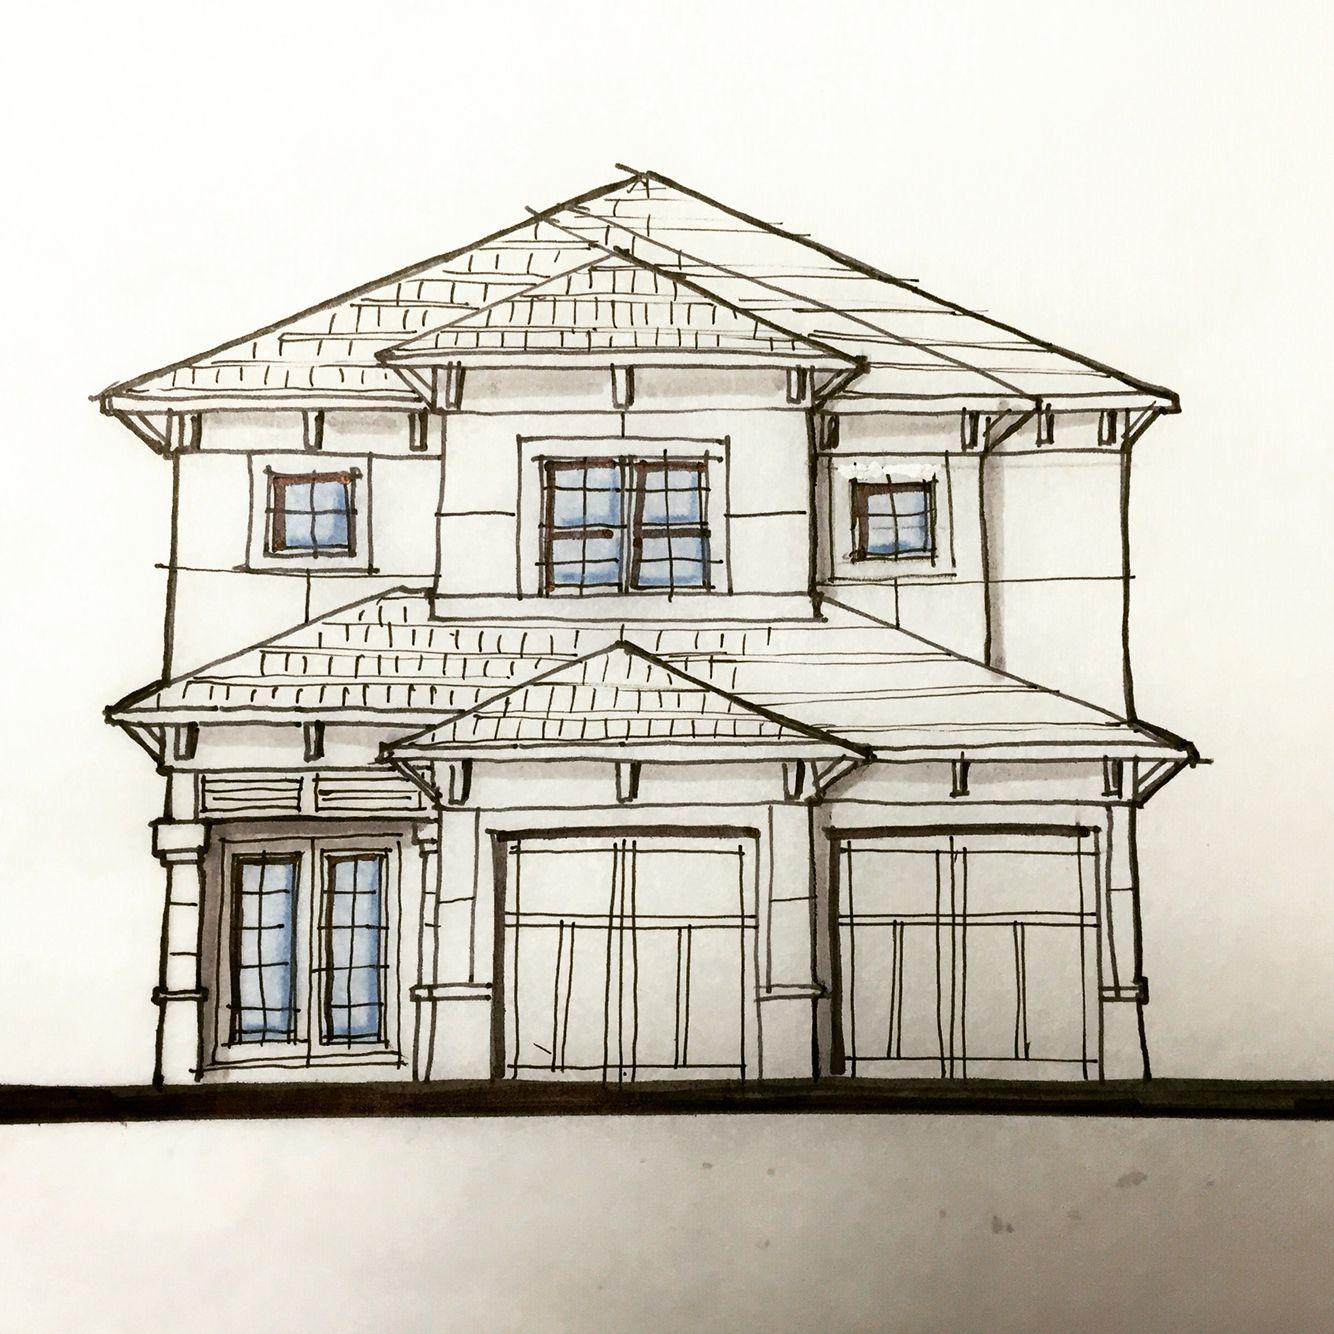 Architecture design house home sketch drawing also by david grussgott rh za pinterest